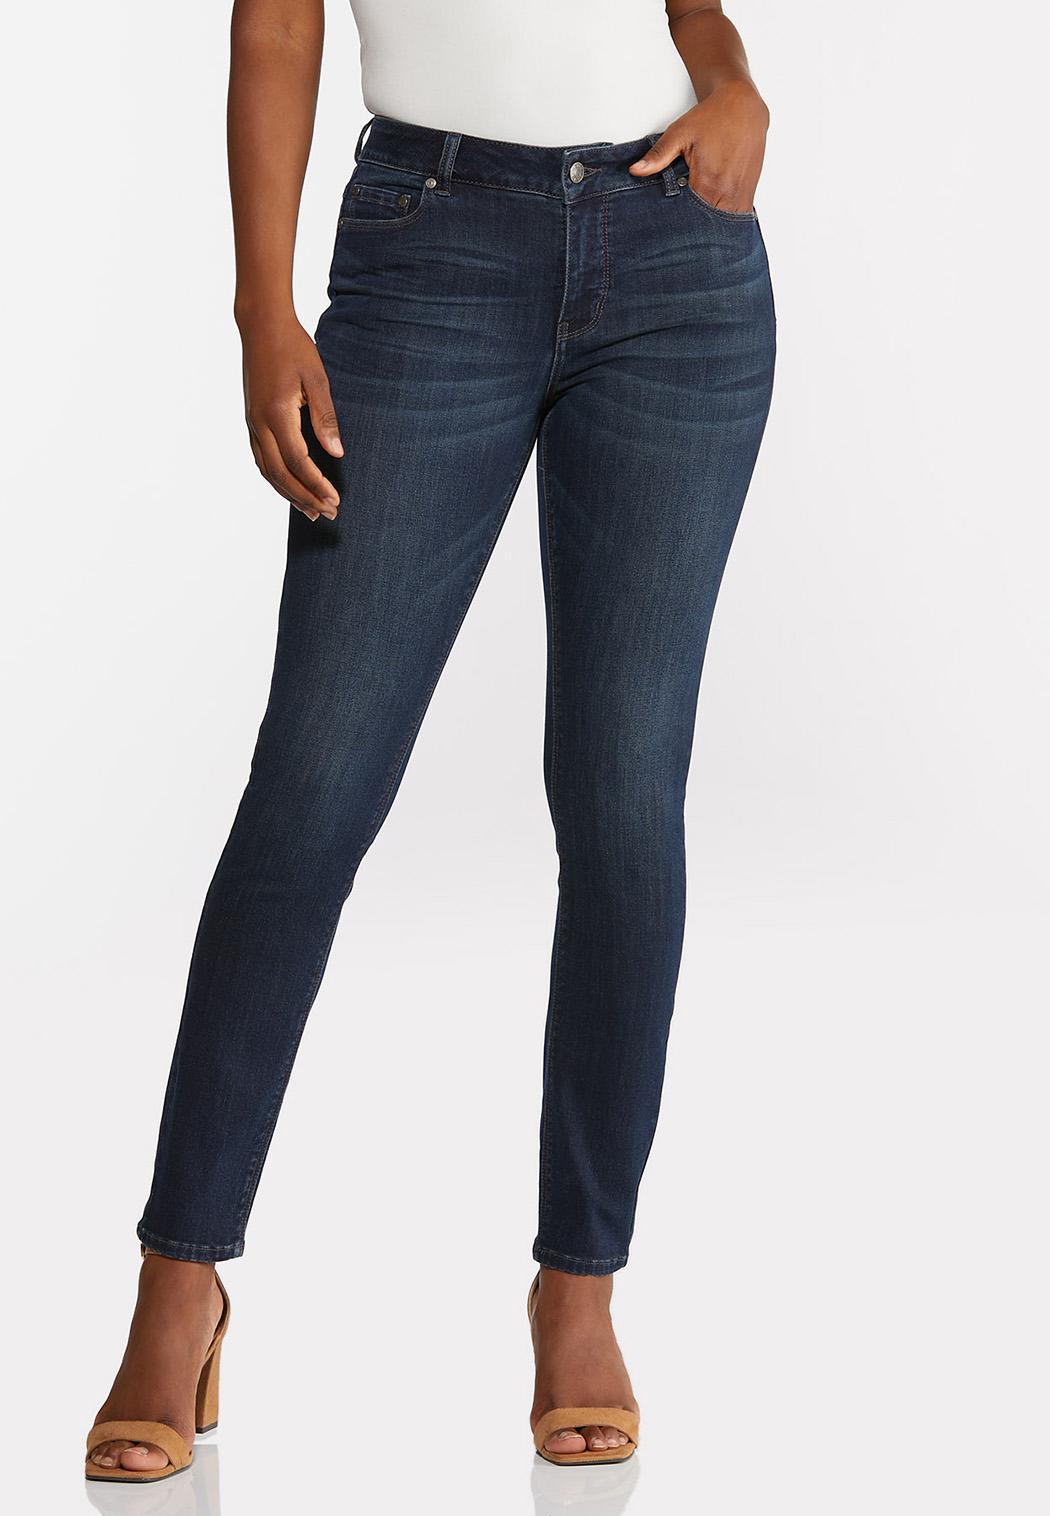 Petite Dark Wash Skinny Jeans